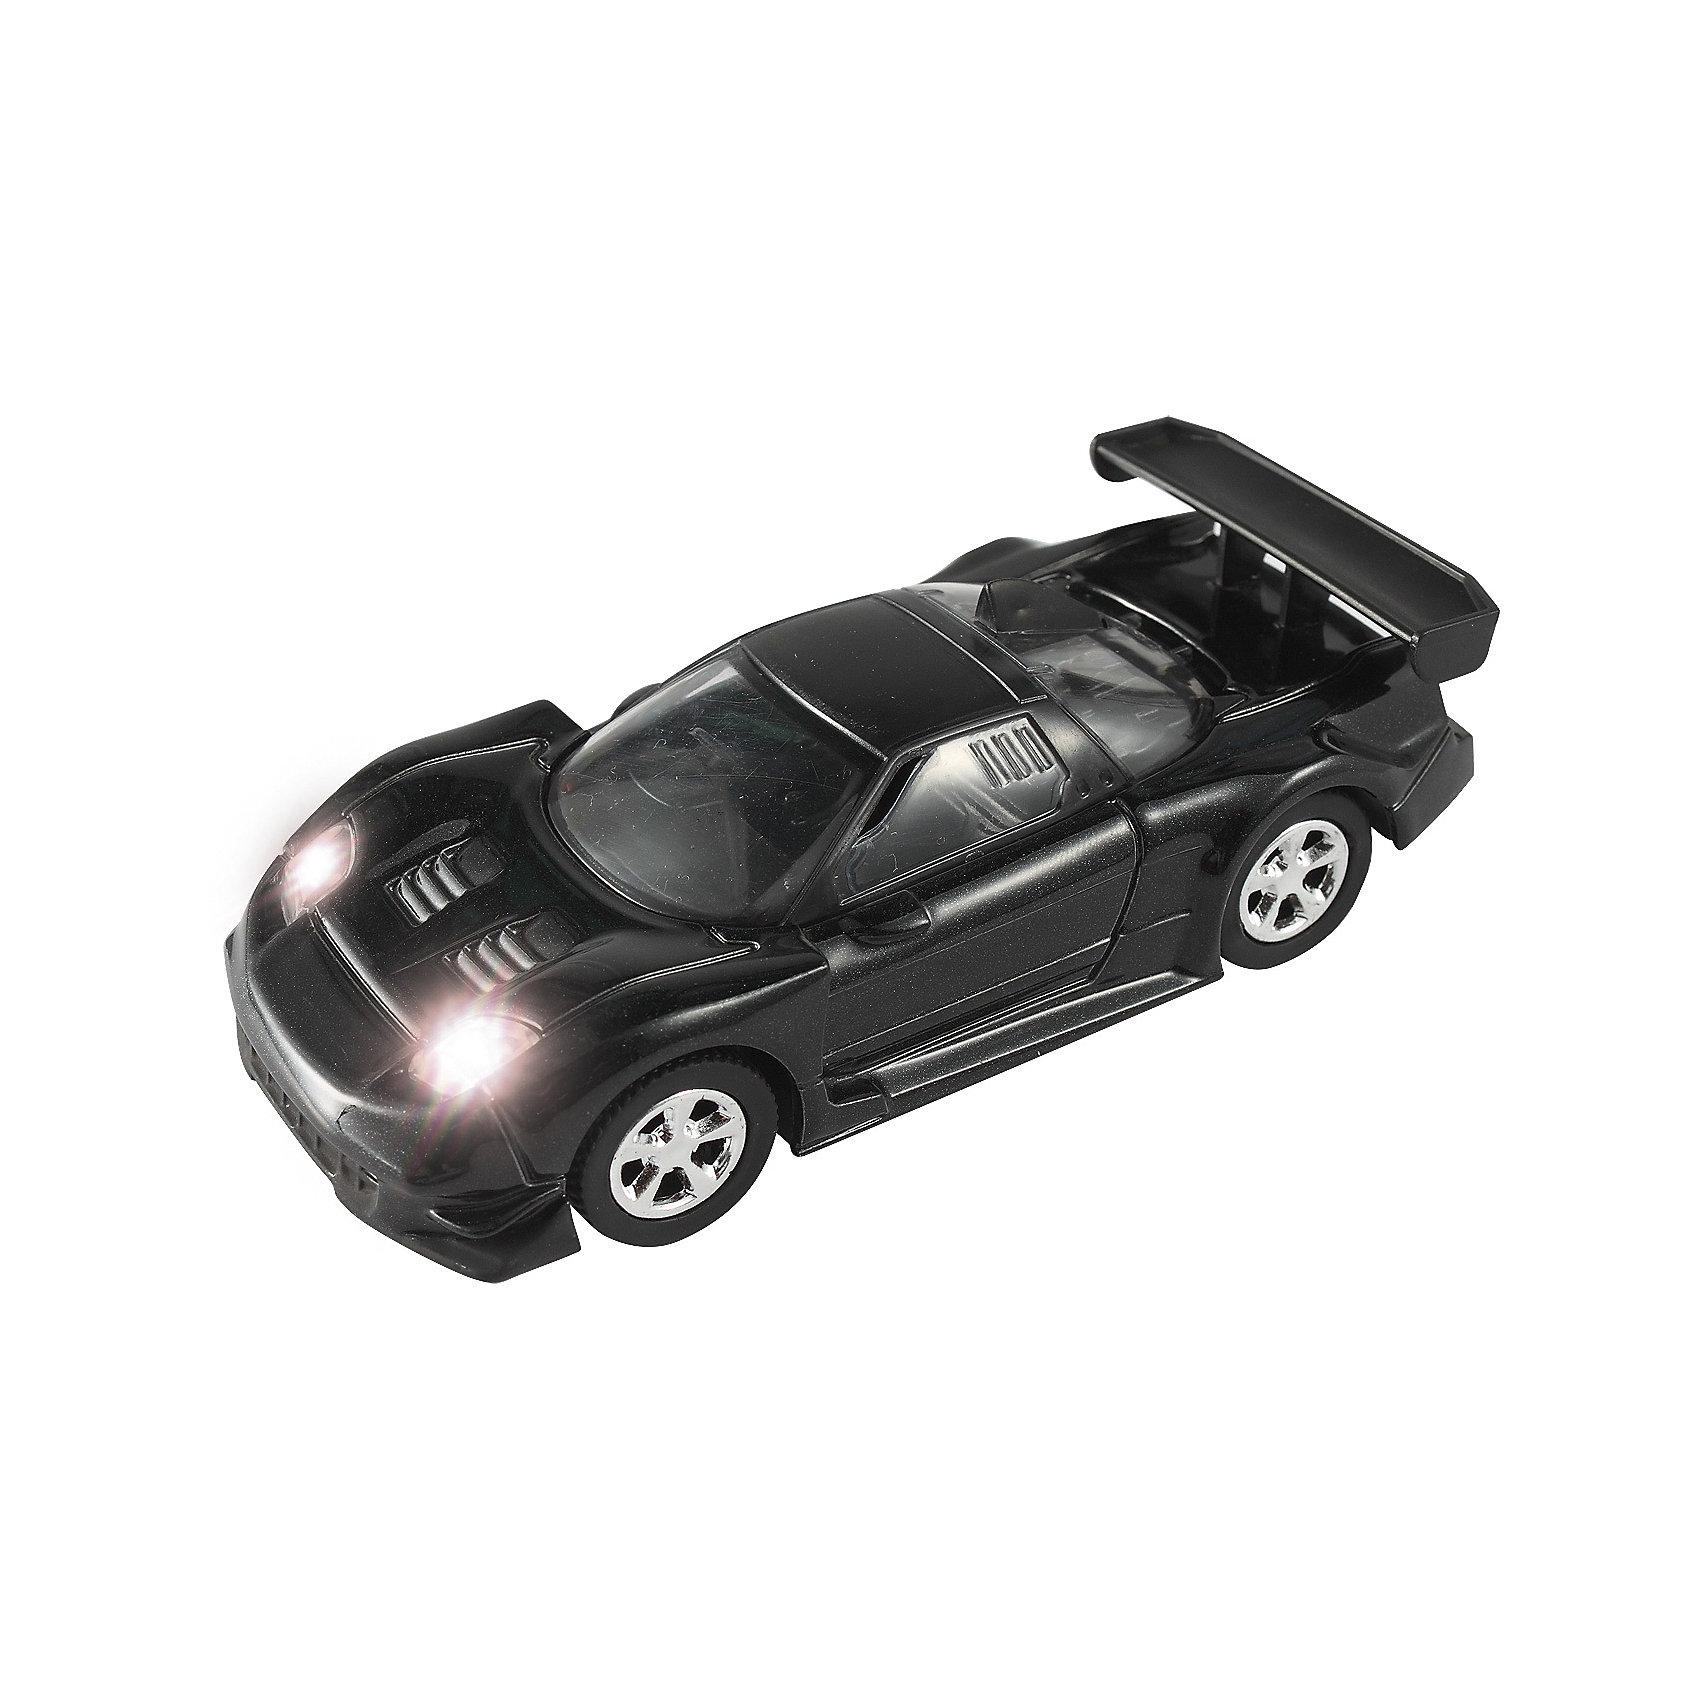 Машинка Japan Streetracer со светом фар 1:43, AutotimeМашинки<br><br><br>Ширина мм: 165<br>Глубина мм: 57<br>Высота мм: 75<br>Вес г: 13<br>Возраст от месяцев: 36<br>Возраст до месяцев: 2147483647<br>Пол: Мужской<br>Возраст: Детский<br>SKU: 5584039